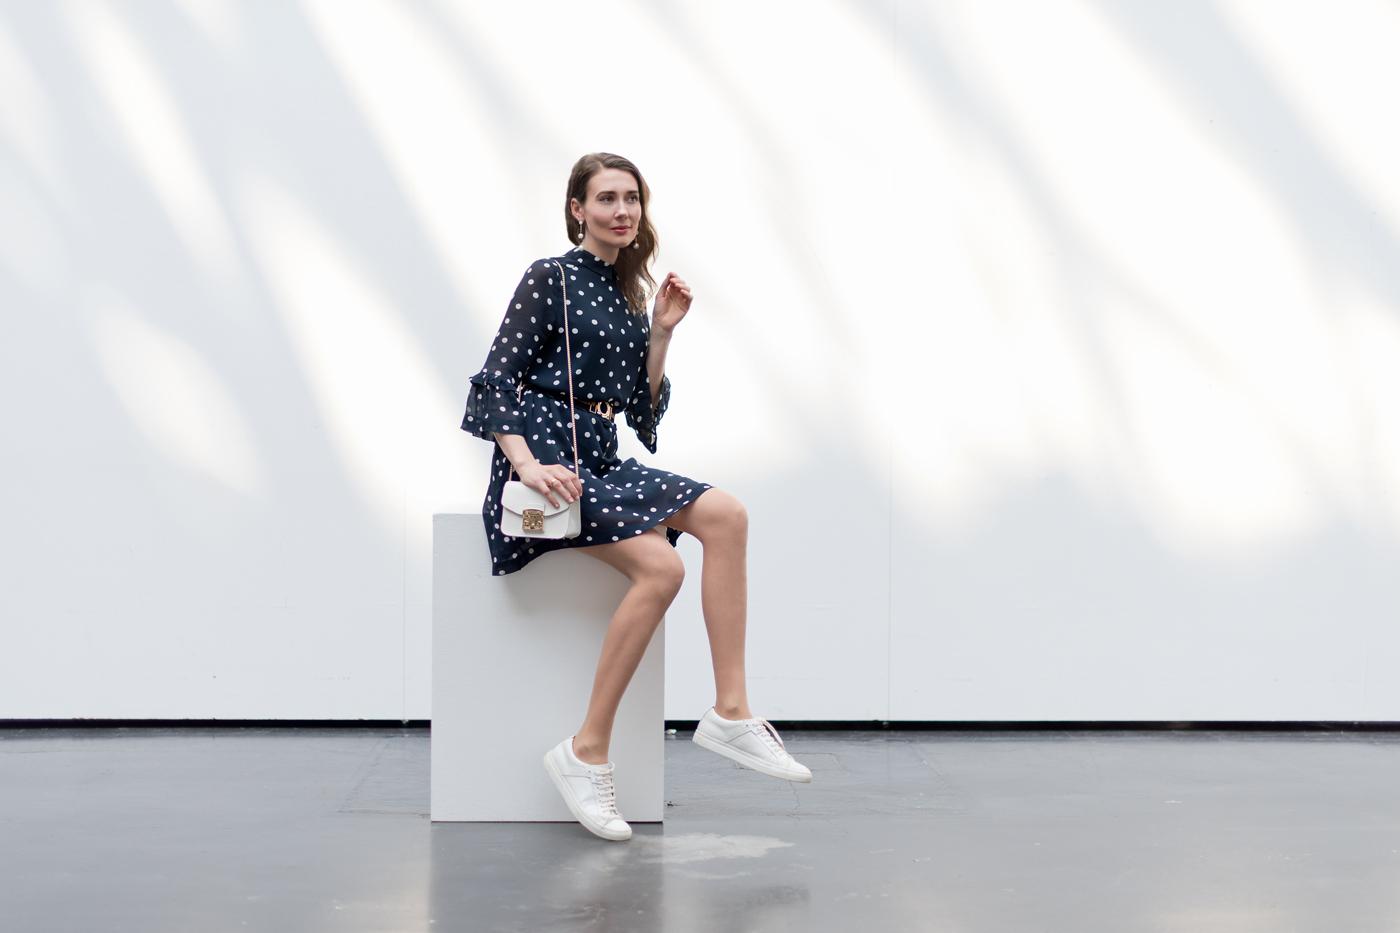 Outfit: Polka Dots Dress